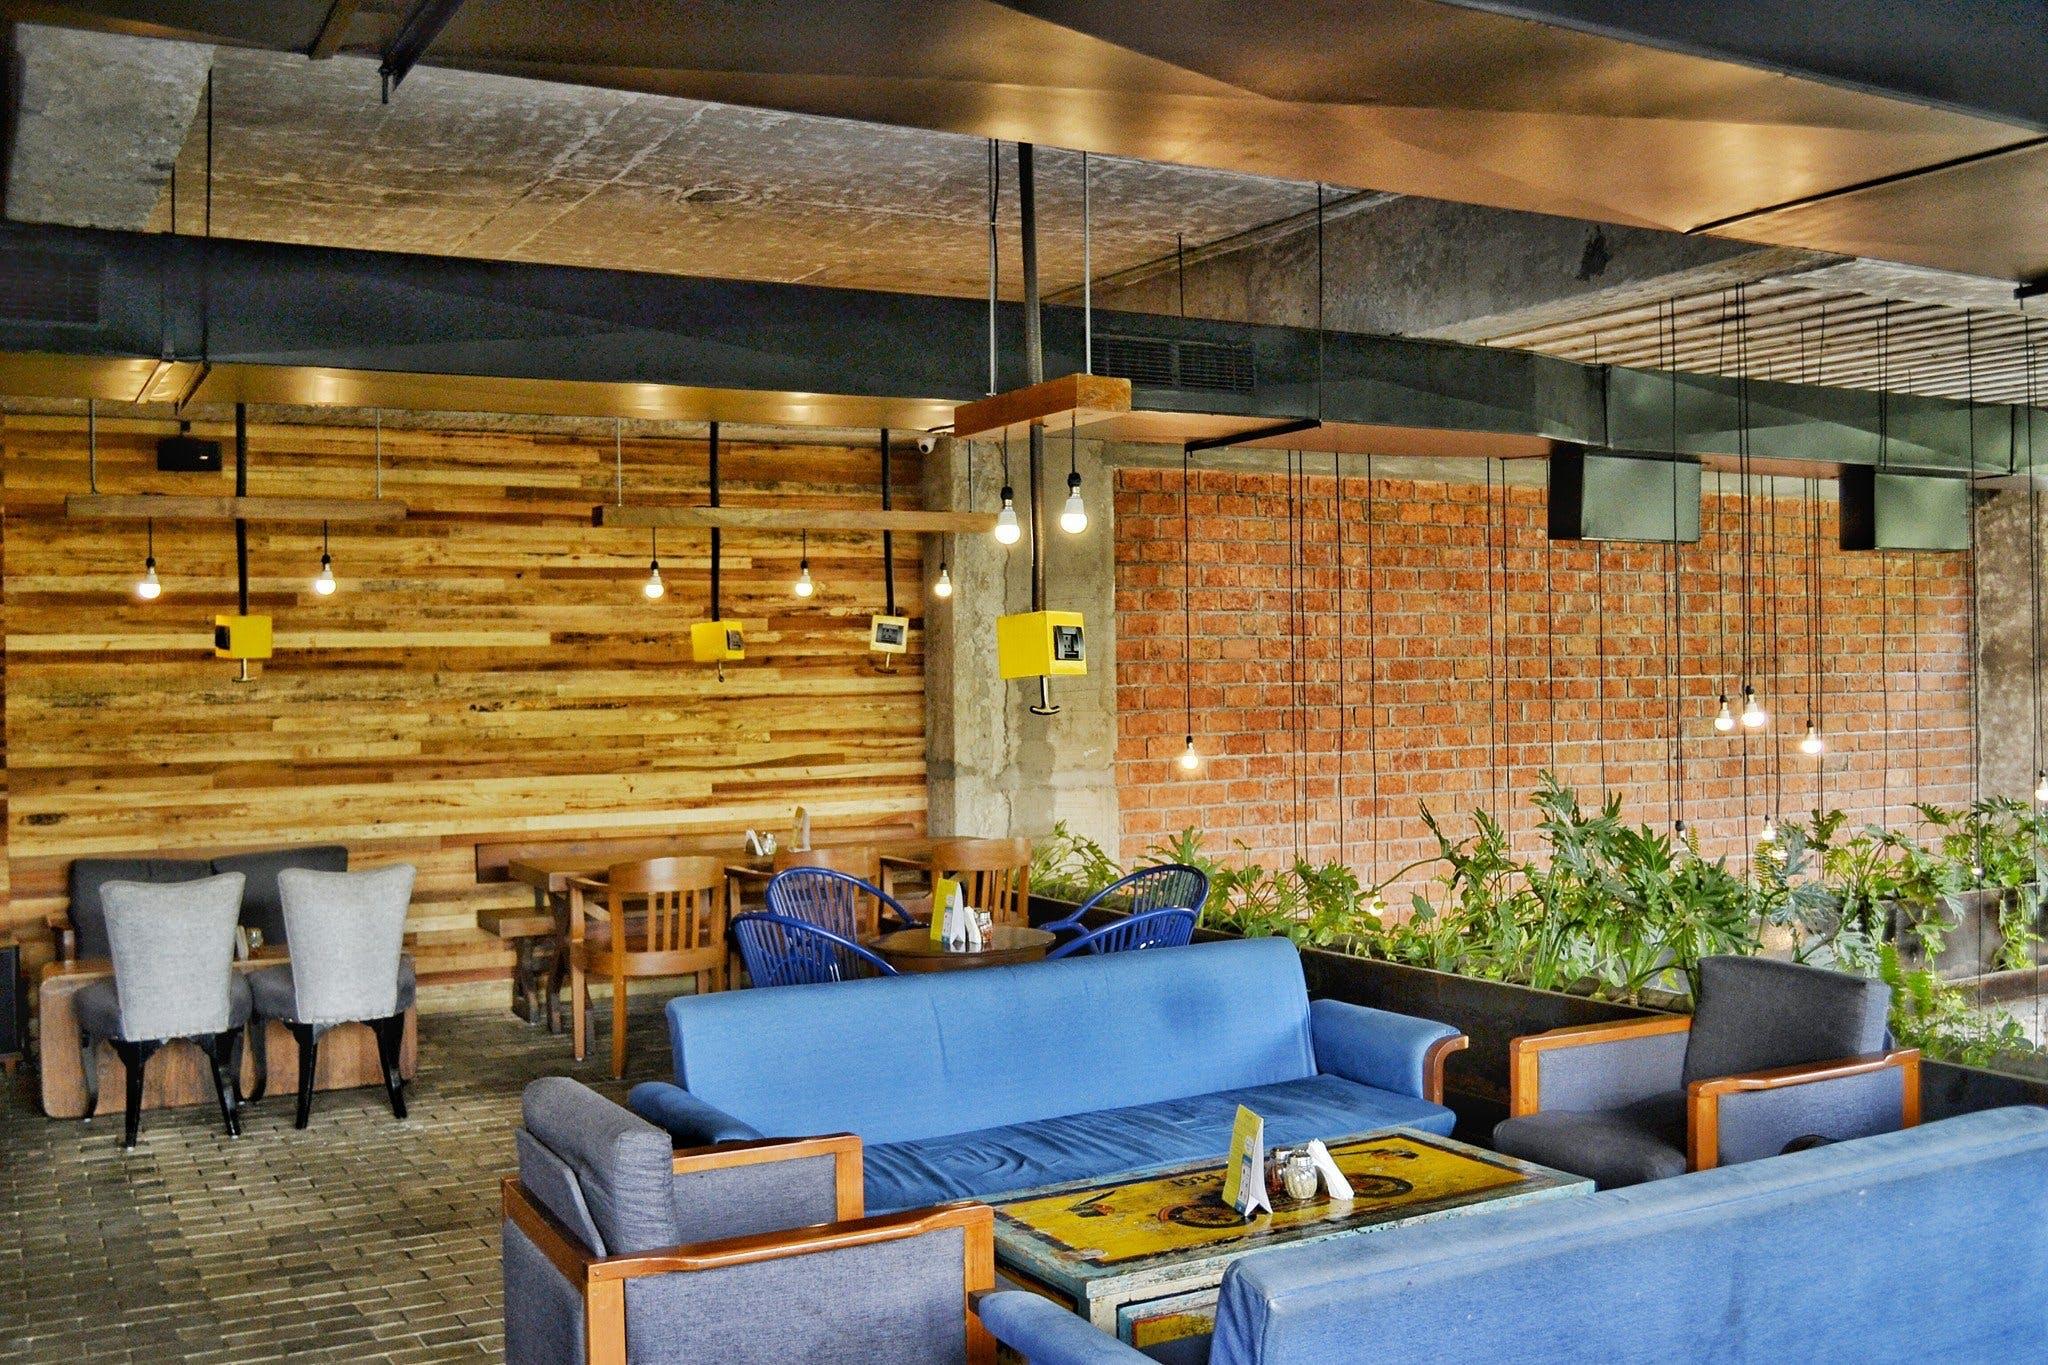 Blue Fabric 4-piece Sofa Set Under Lighted Hanging Bulbs